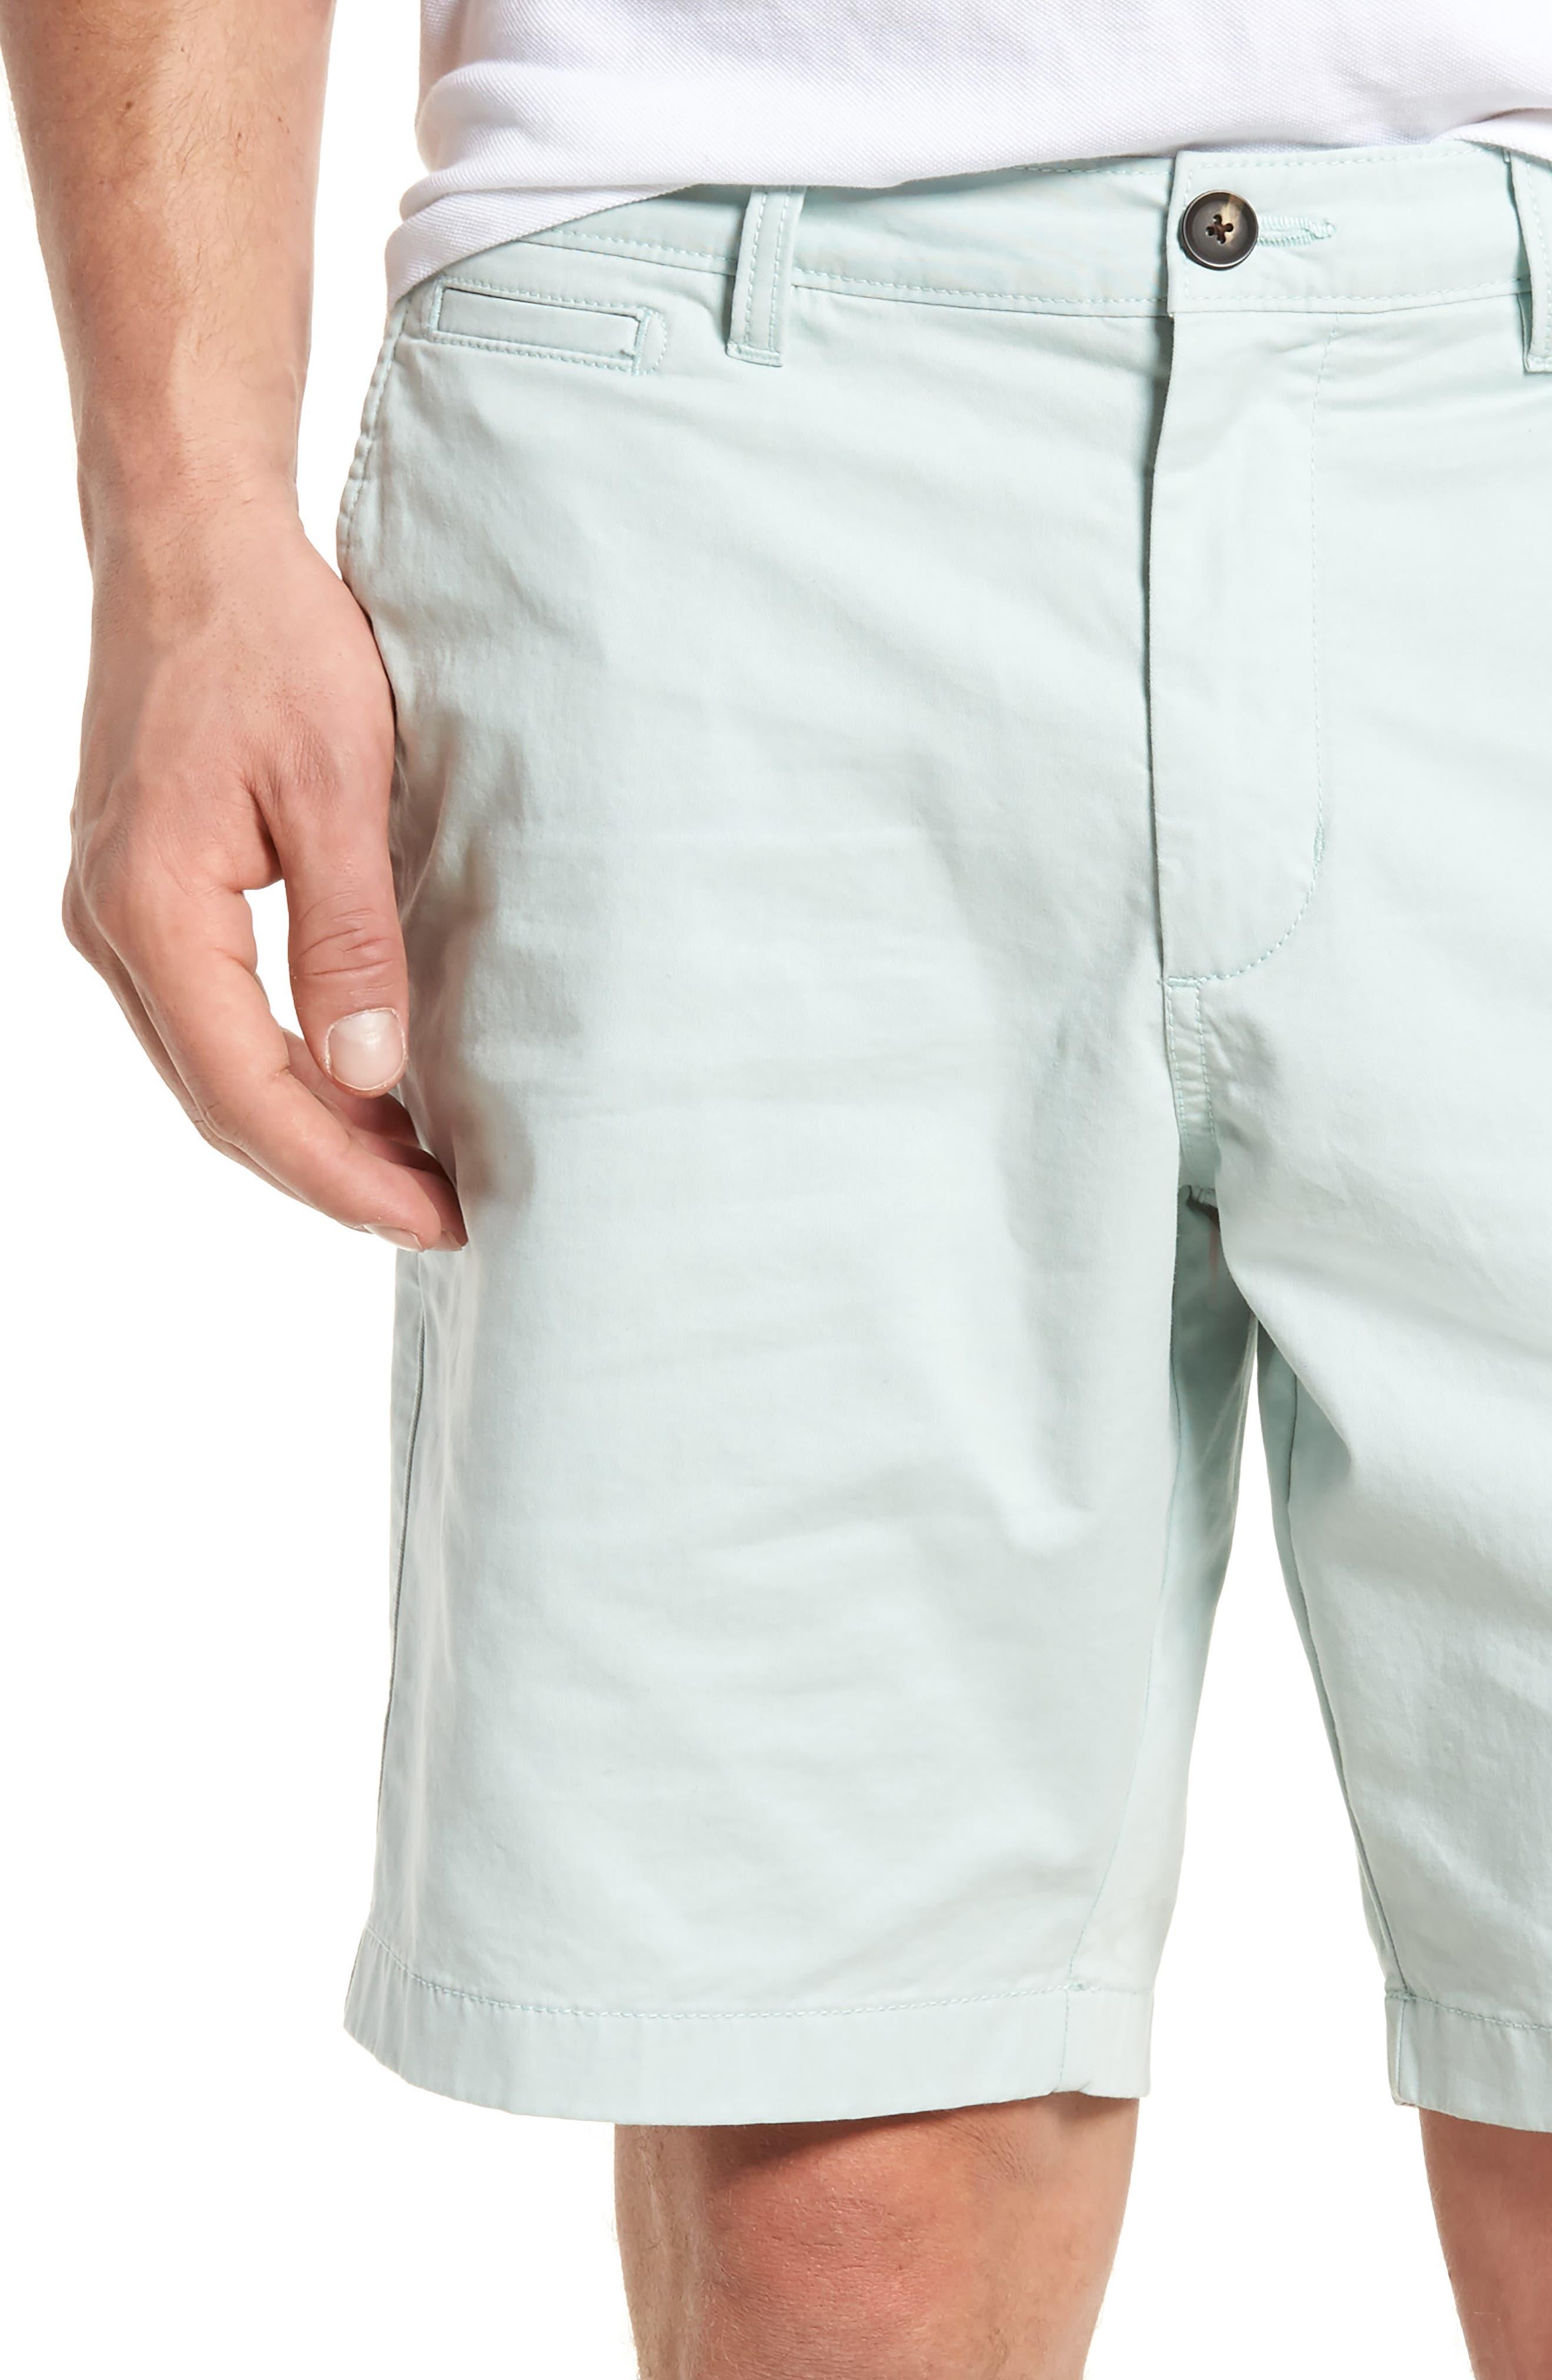 Ballard Slim Fit Stretch Chino 9-Inch Shorts,                             Alternate thumbnail 44, color,